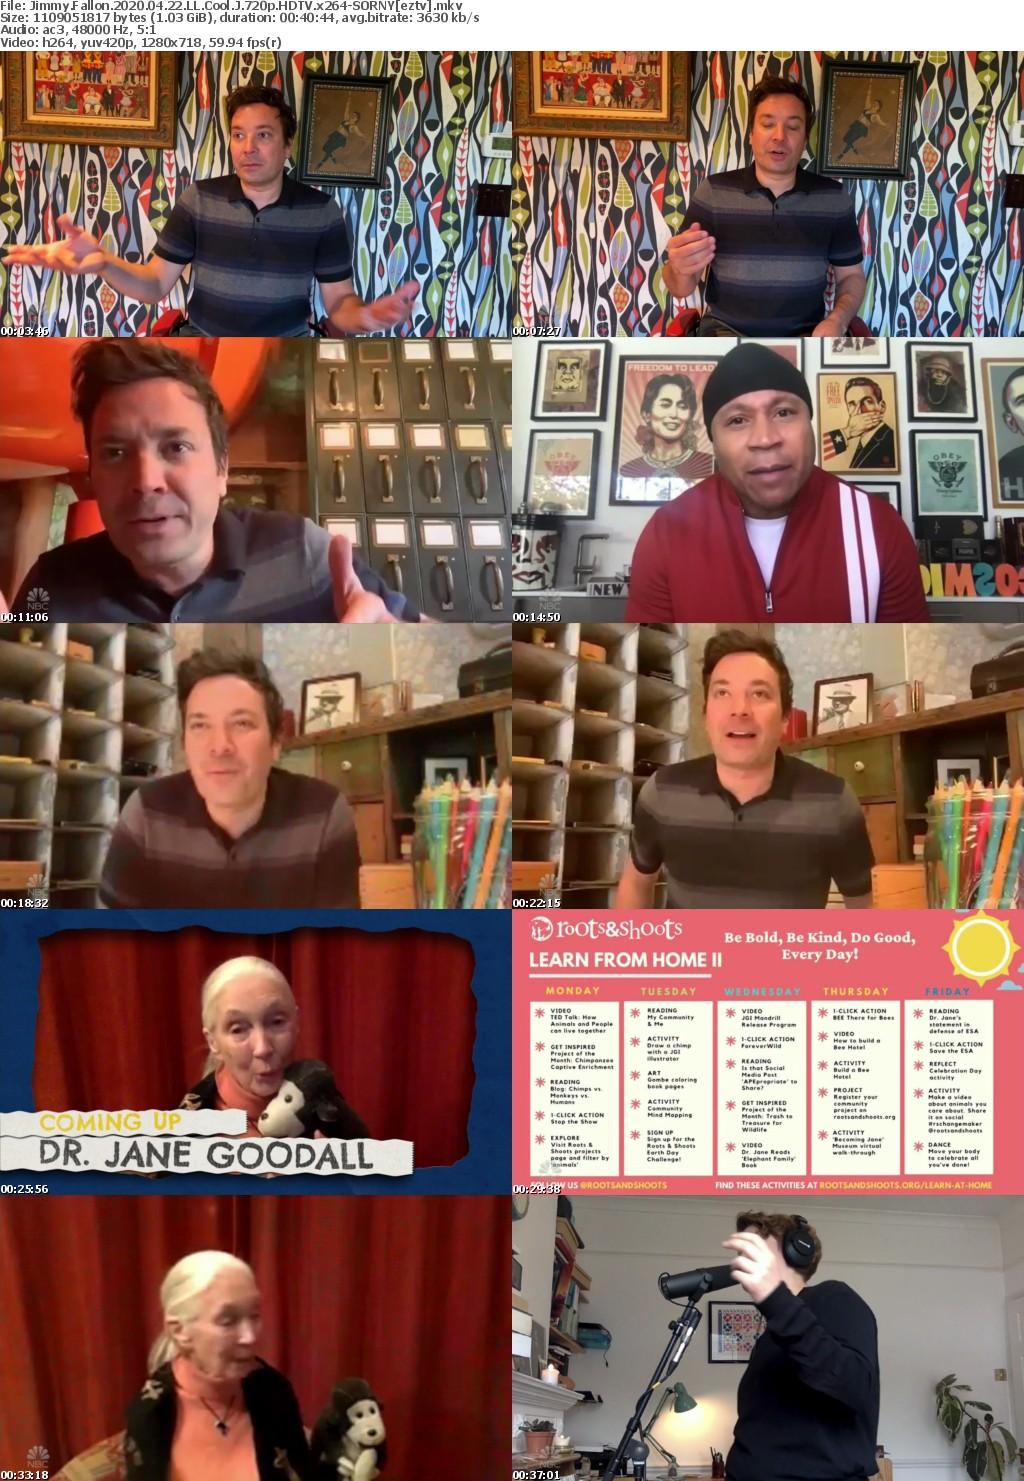 Jimmy Fallon 2020 04 22 LL Cool J 720p HDTV x264-SORNY